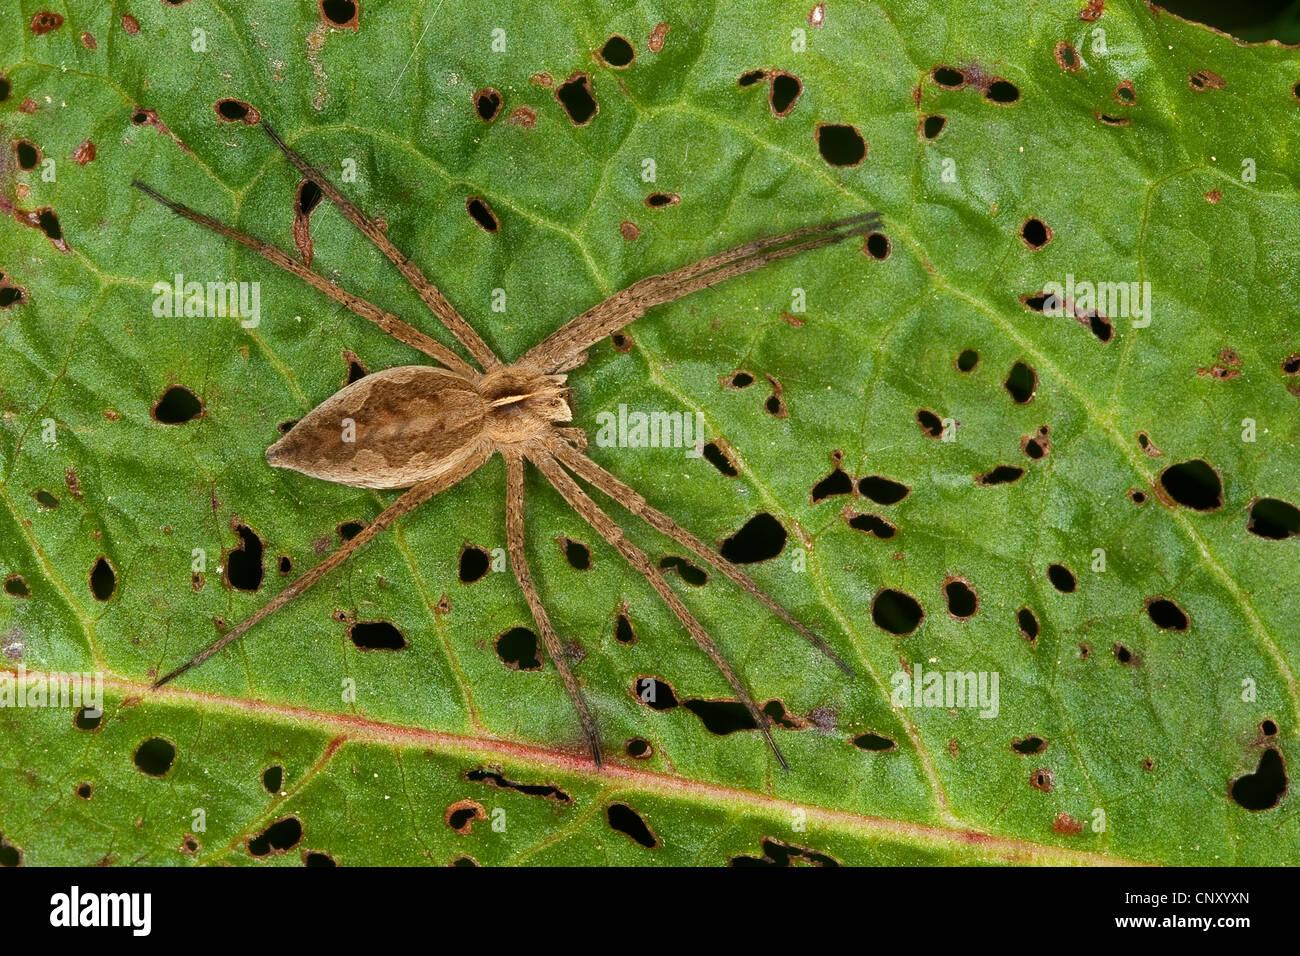 nursery web spider, fantastic fishing spider (Pisaura mirabilis), sitting on a leaf, Germany - Stock Image